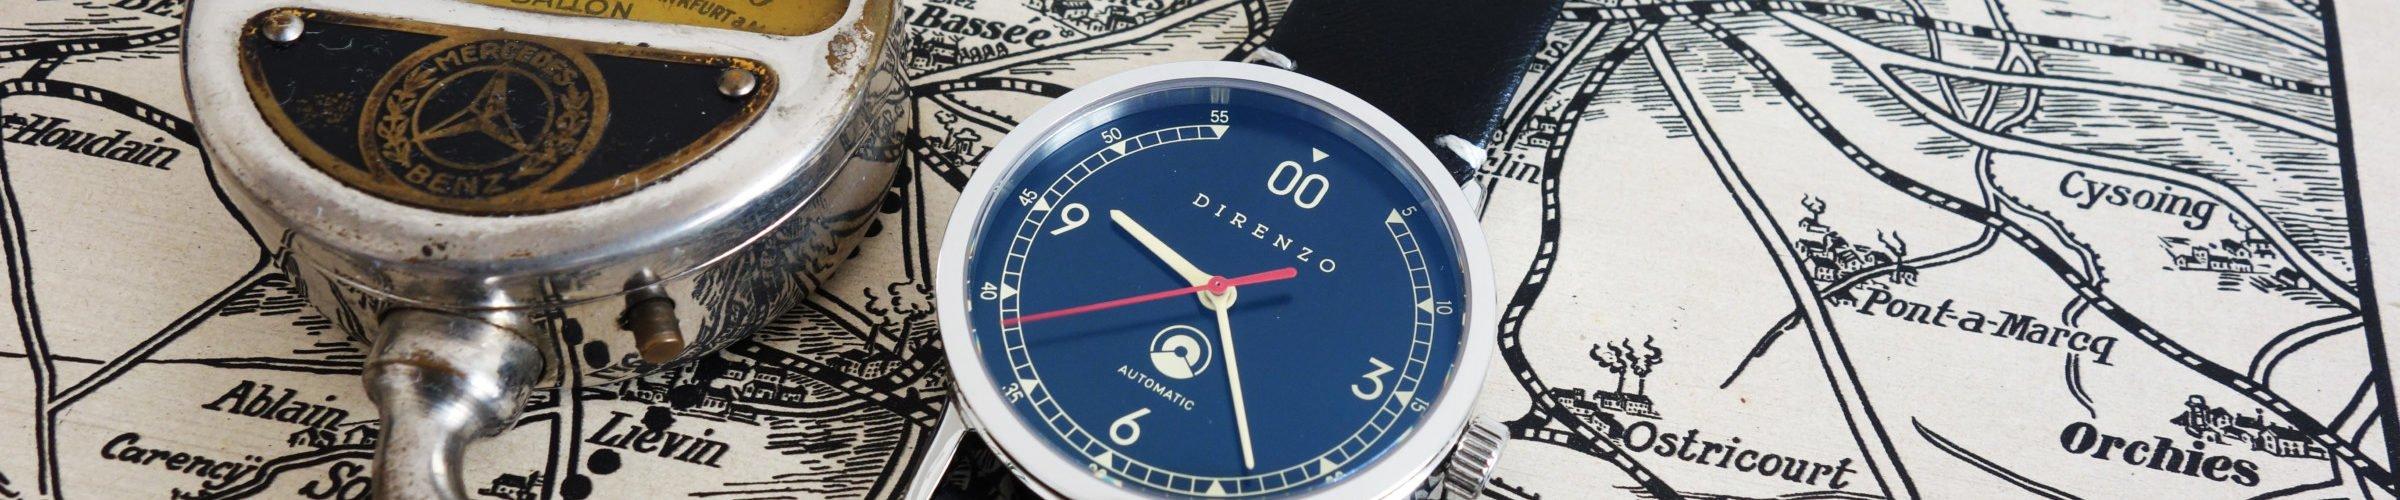 Direnzo Vintage DRZ_Type 250F